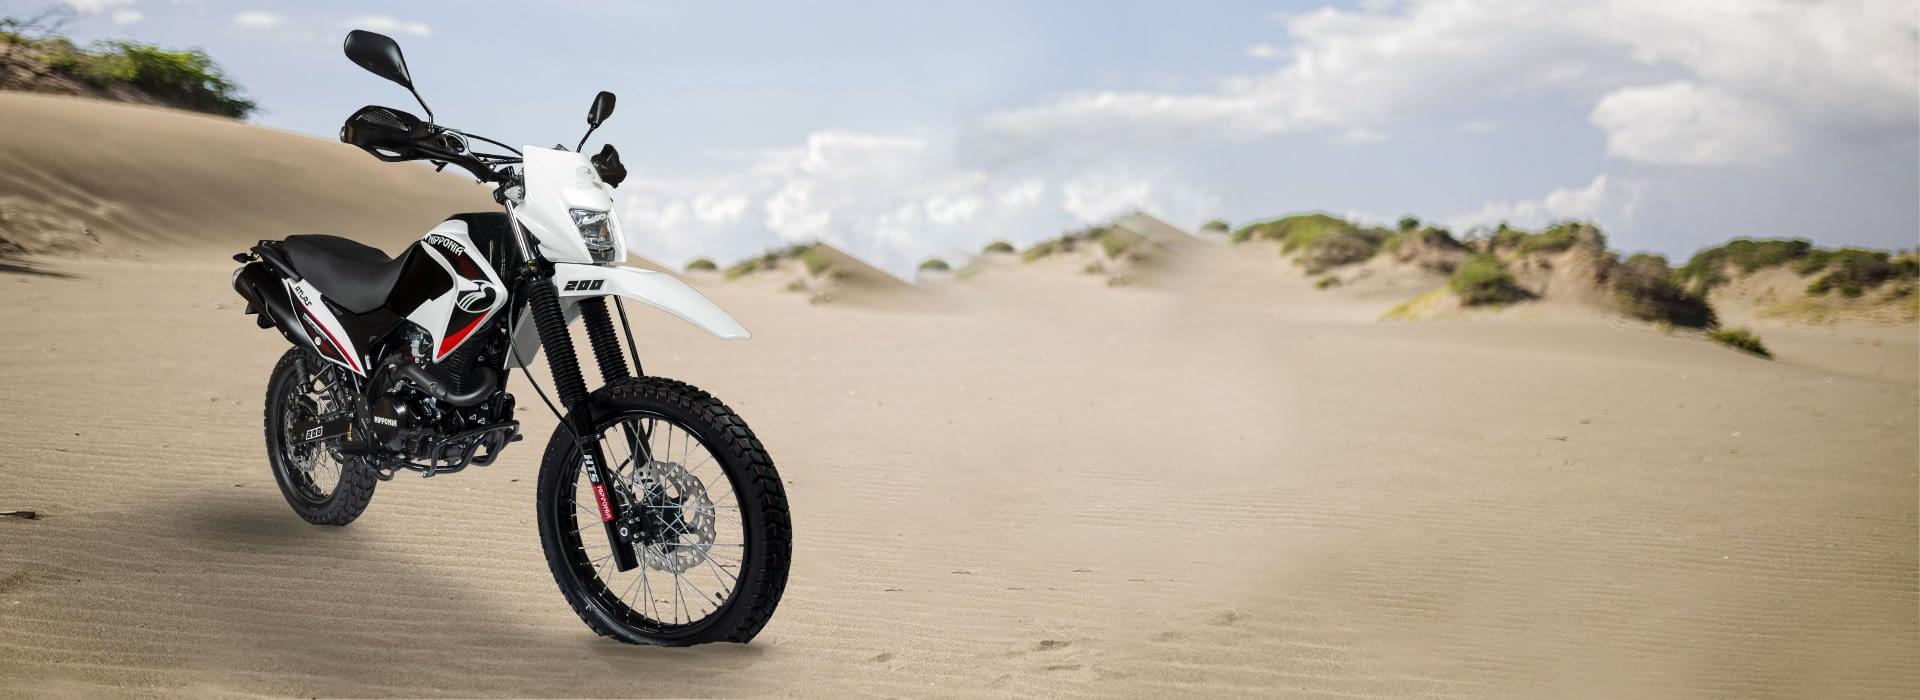 Nipponia Atlas 200 Motocicletas